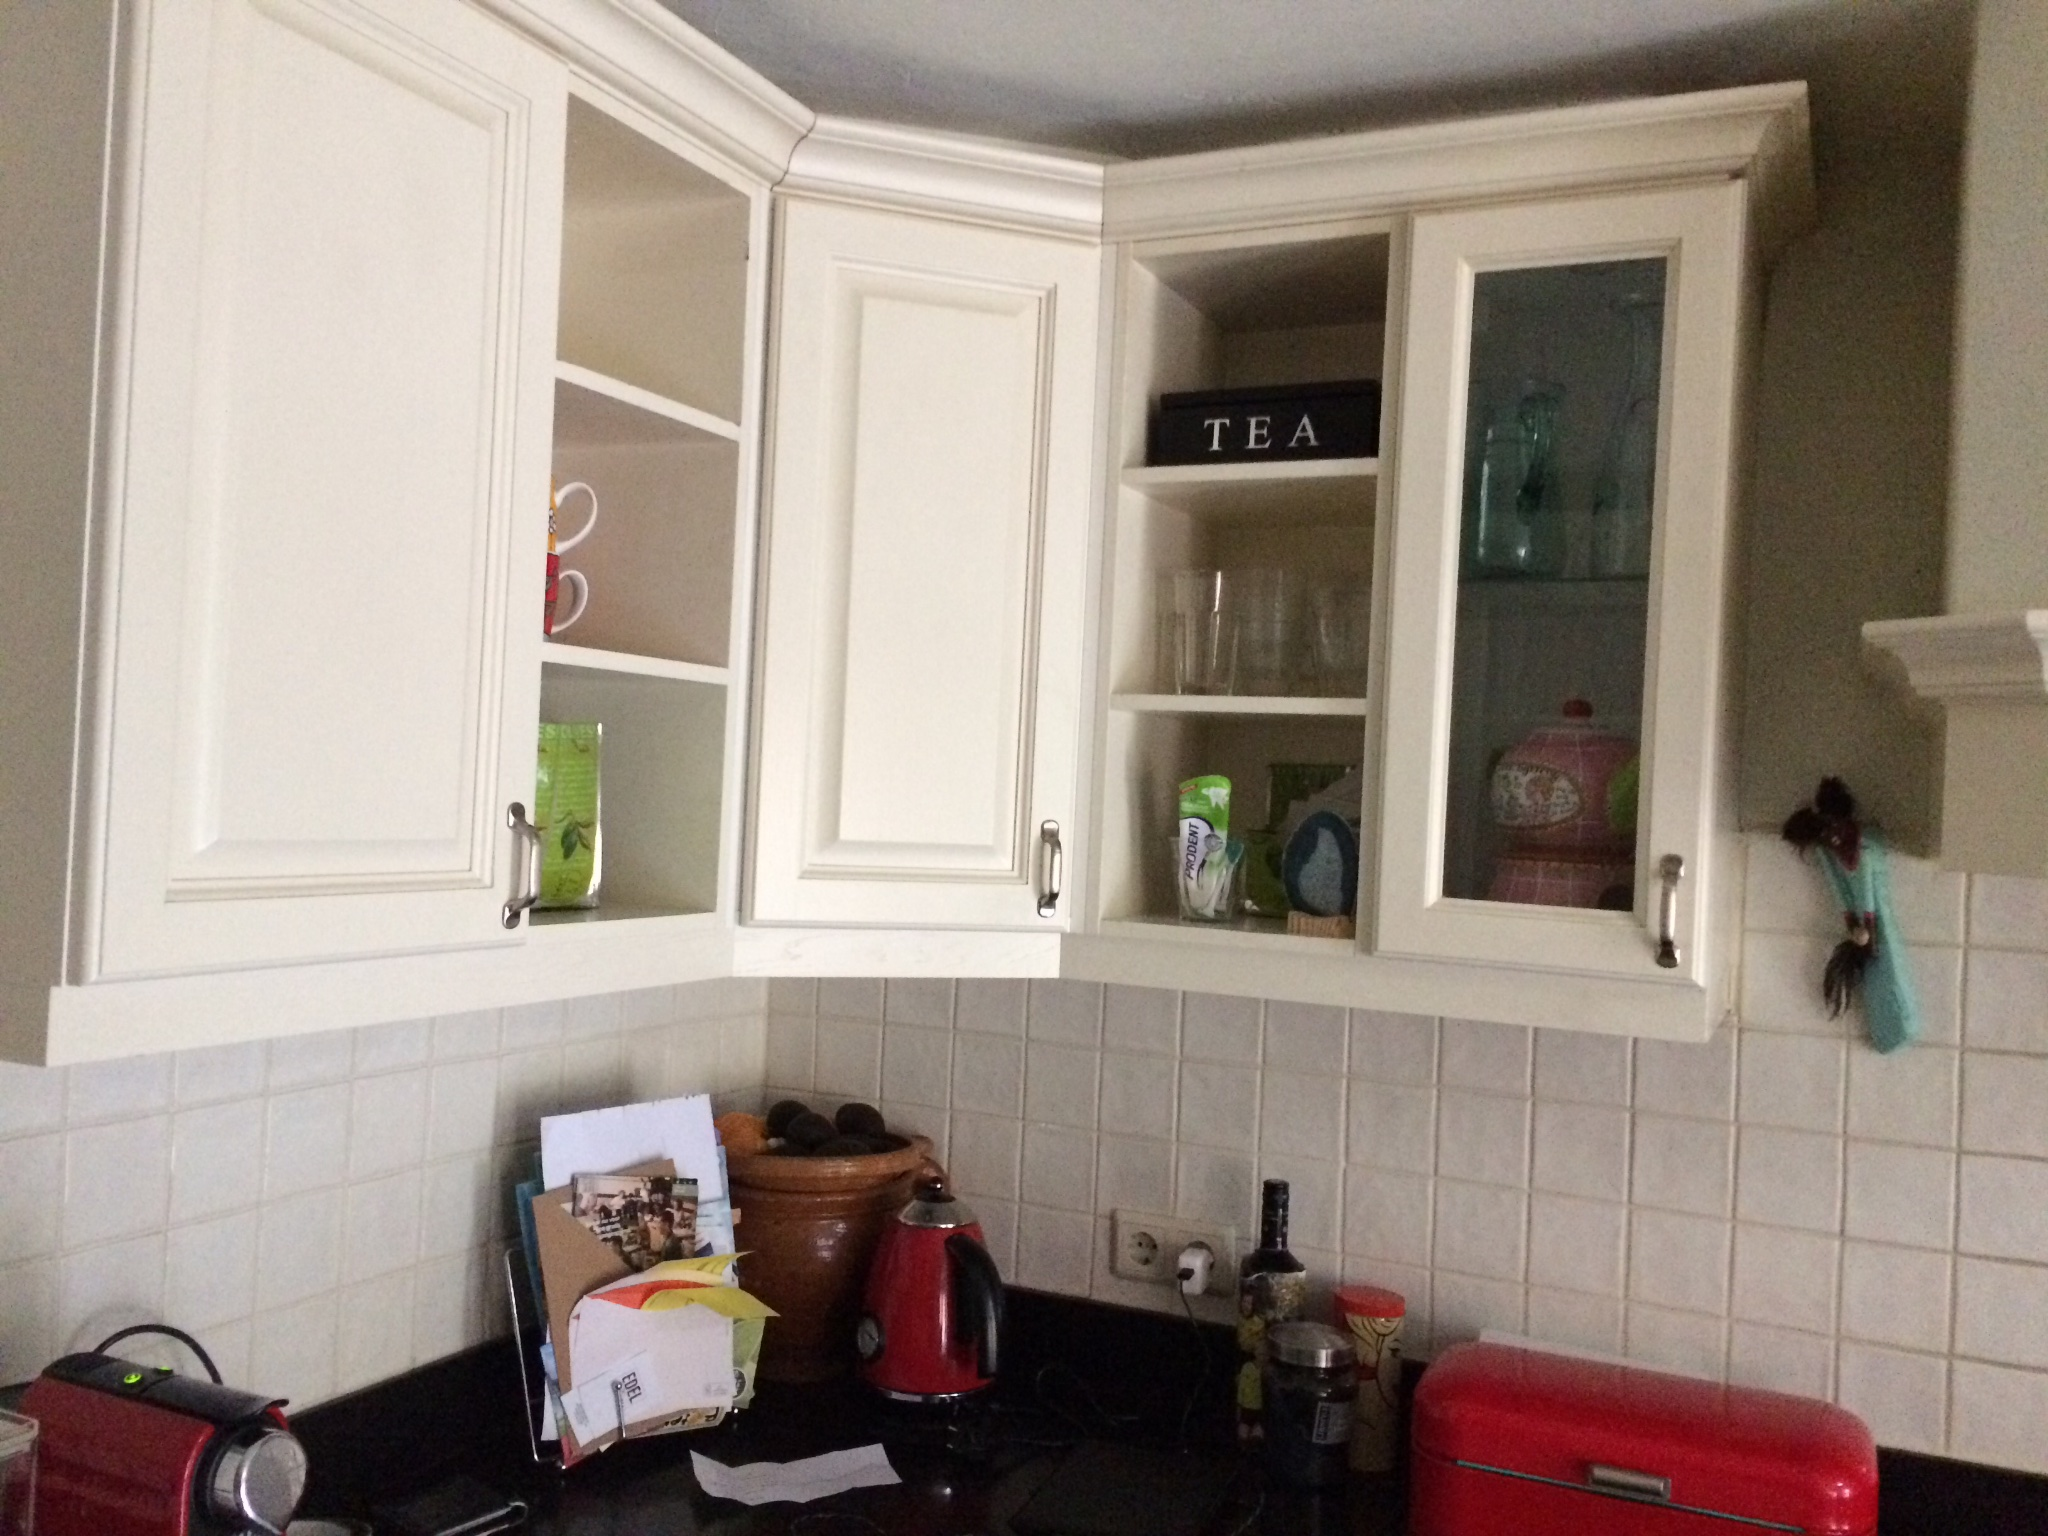 Keuken Met Dakraam : Timmerwerk keuken bovenkastjes eraf maken plafond en lichtkoepel